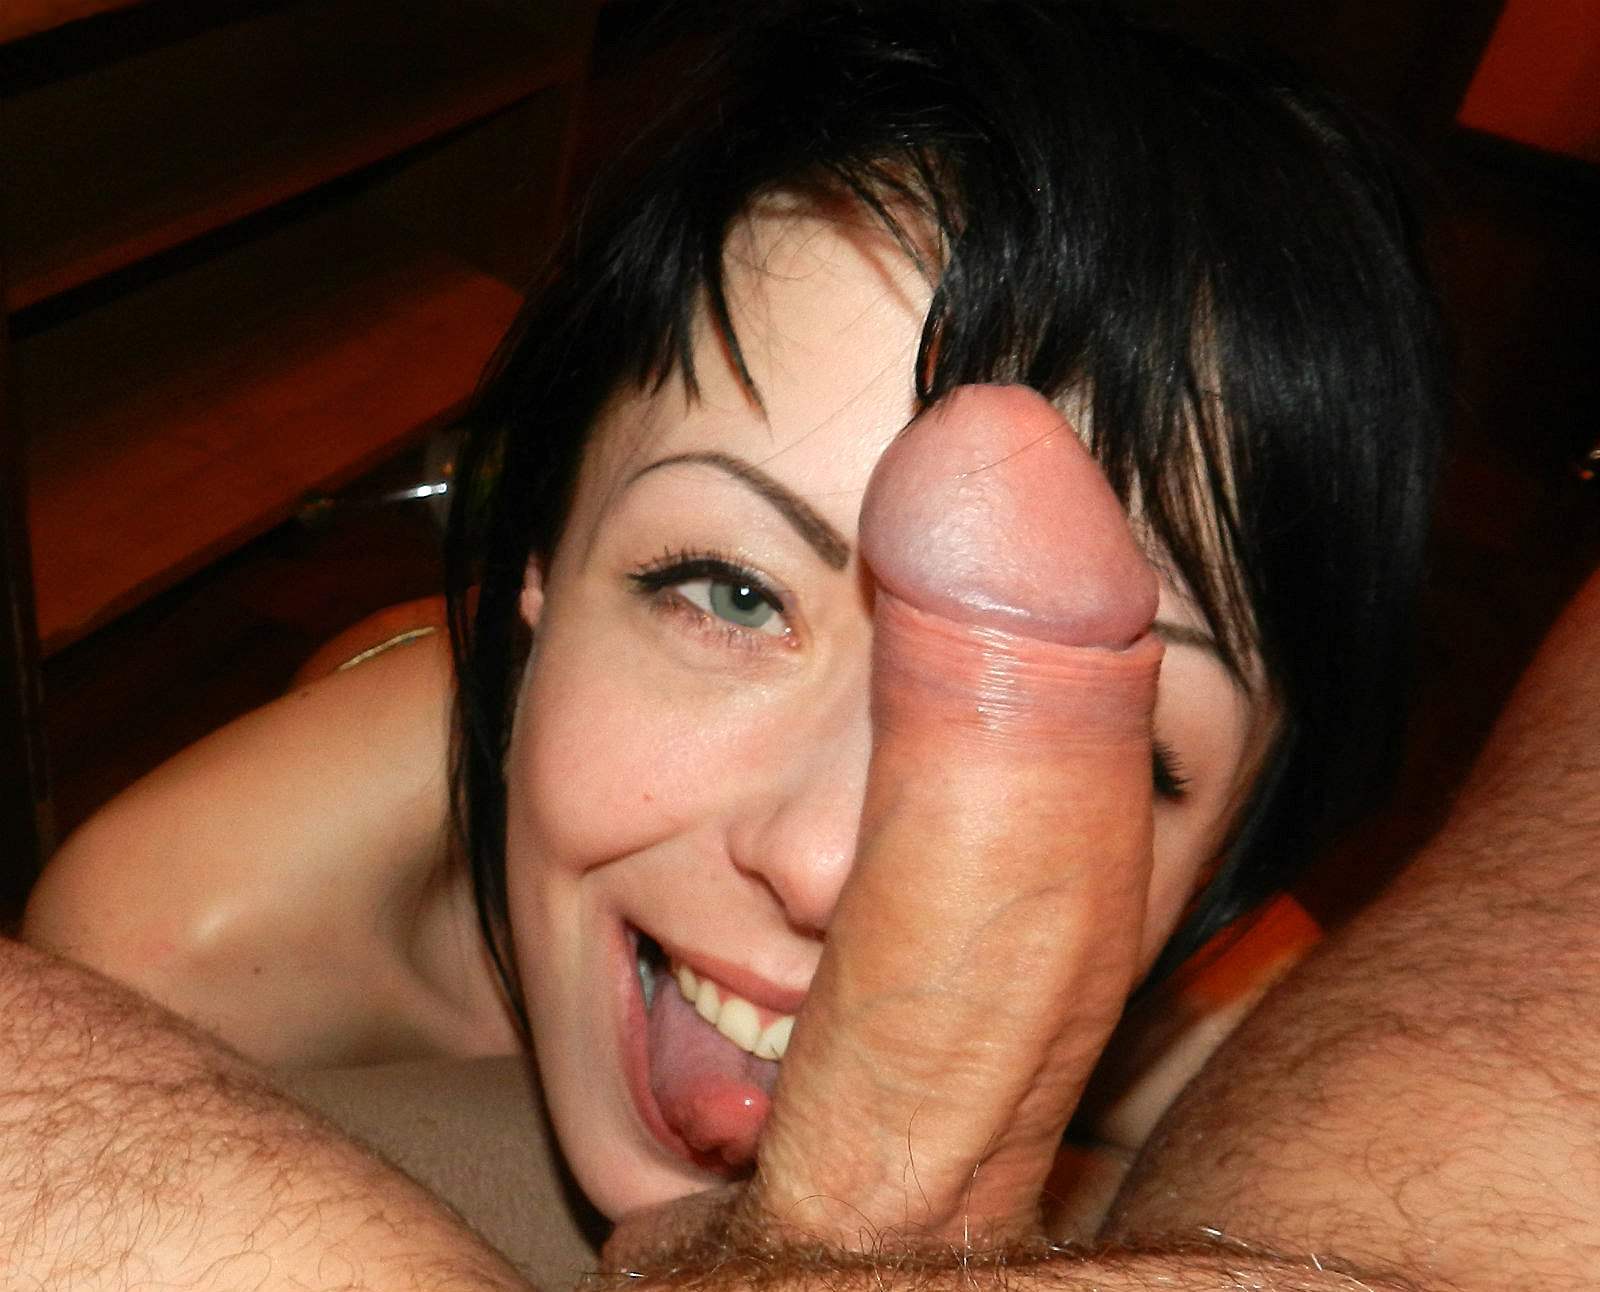 Секс руски девичка 13 фотография